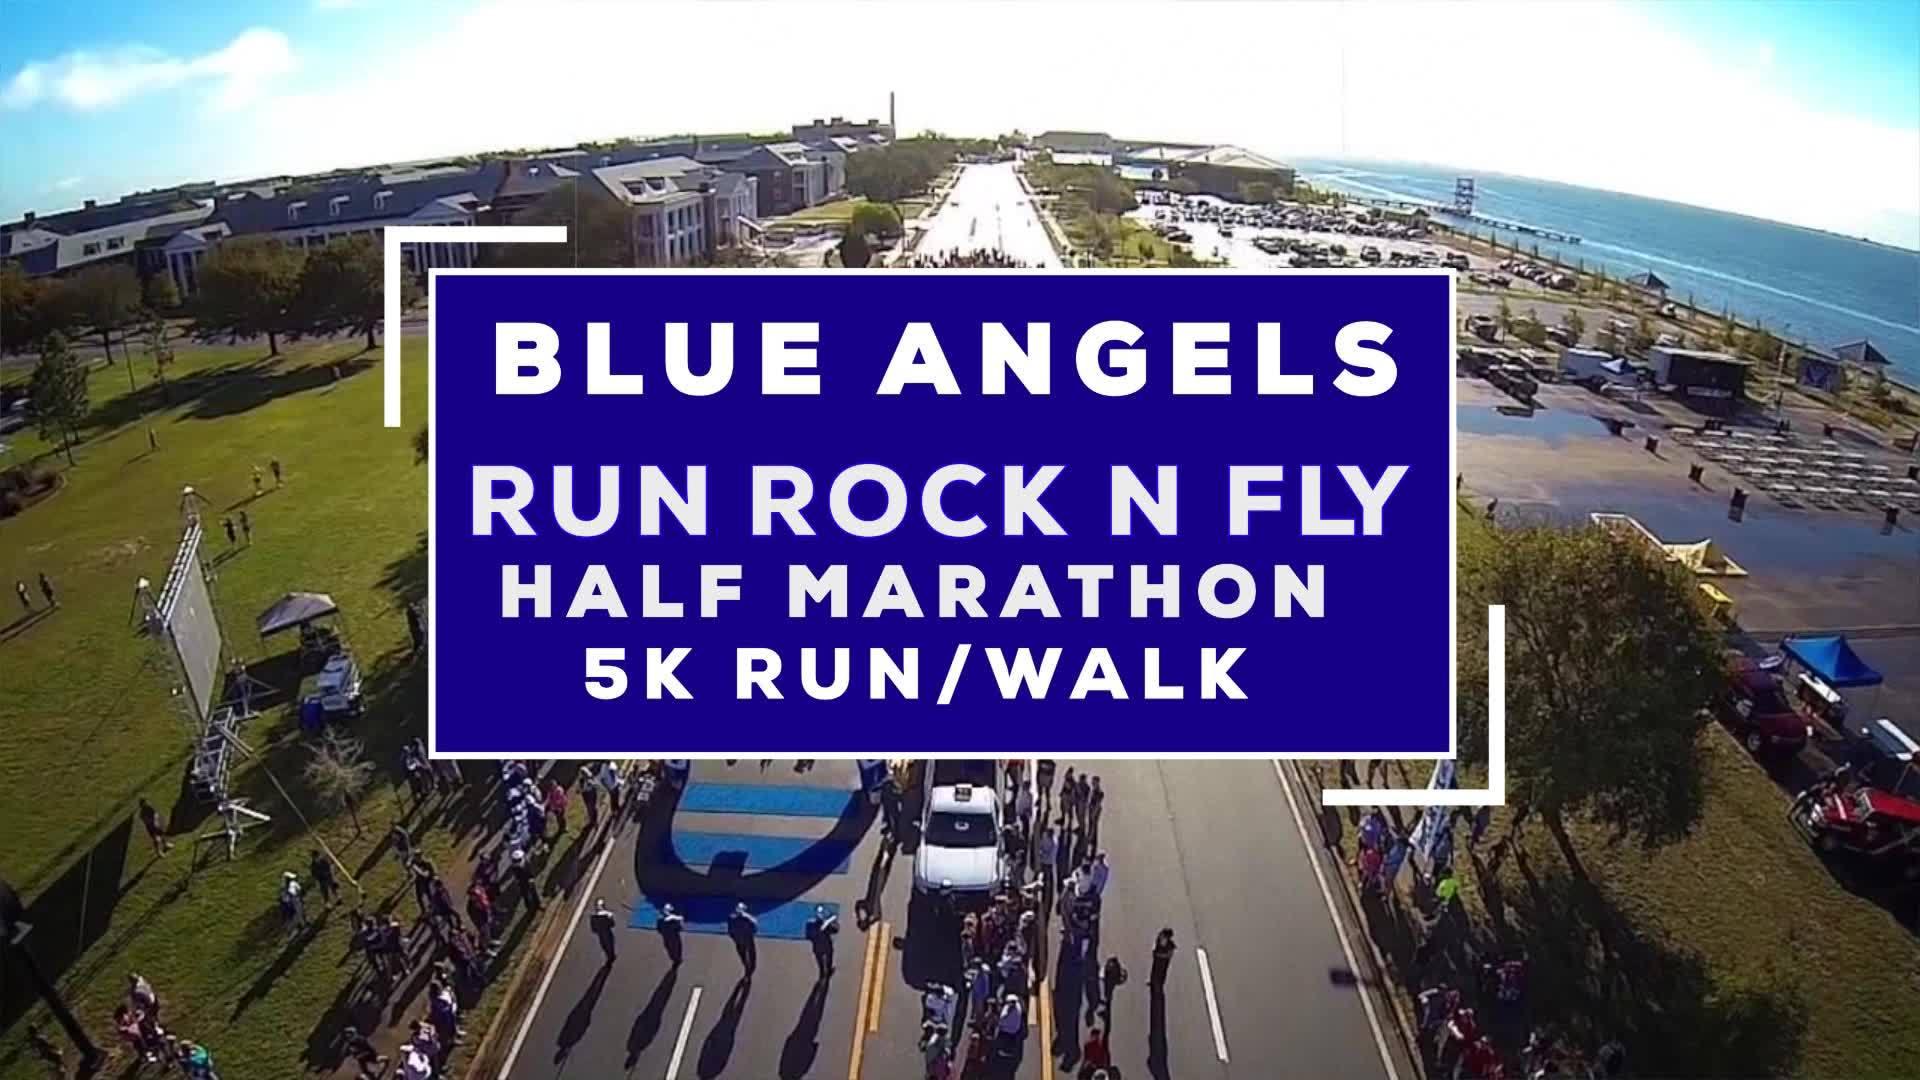 Blue Angels Rock 'N Fly 1/2 Marathon and 5K